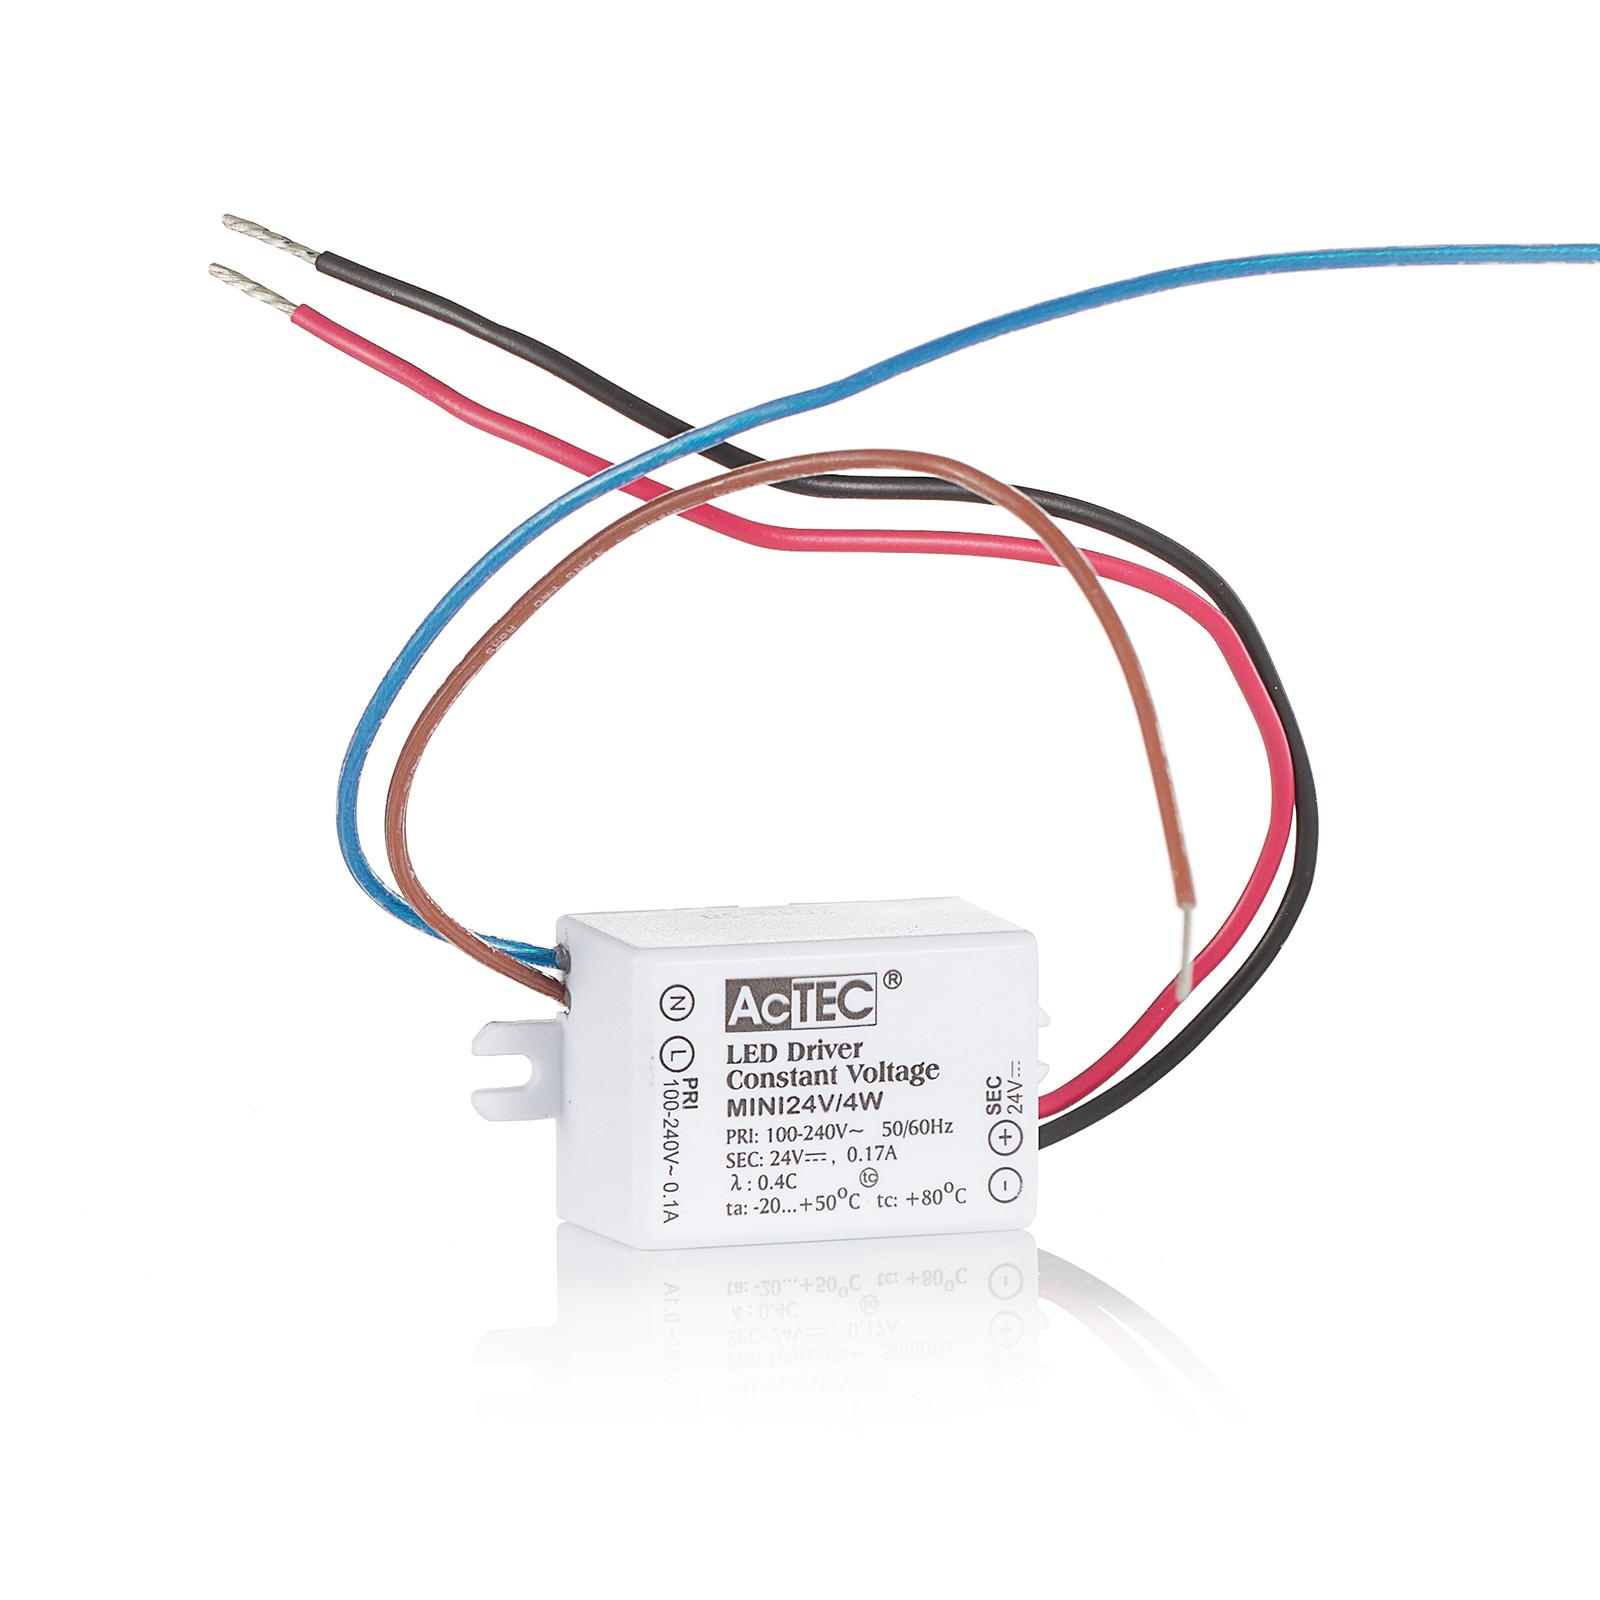 AcTEC Mini LED-Treiber CV 24V, 4W, IP65